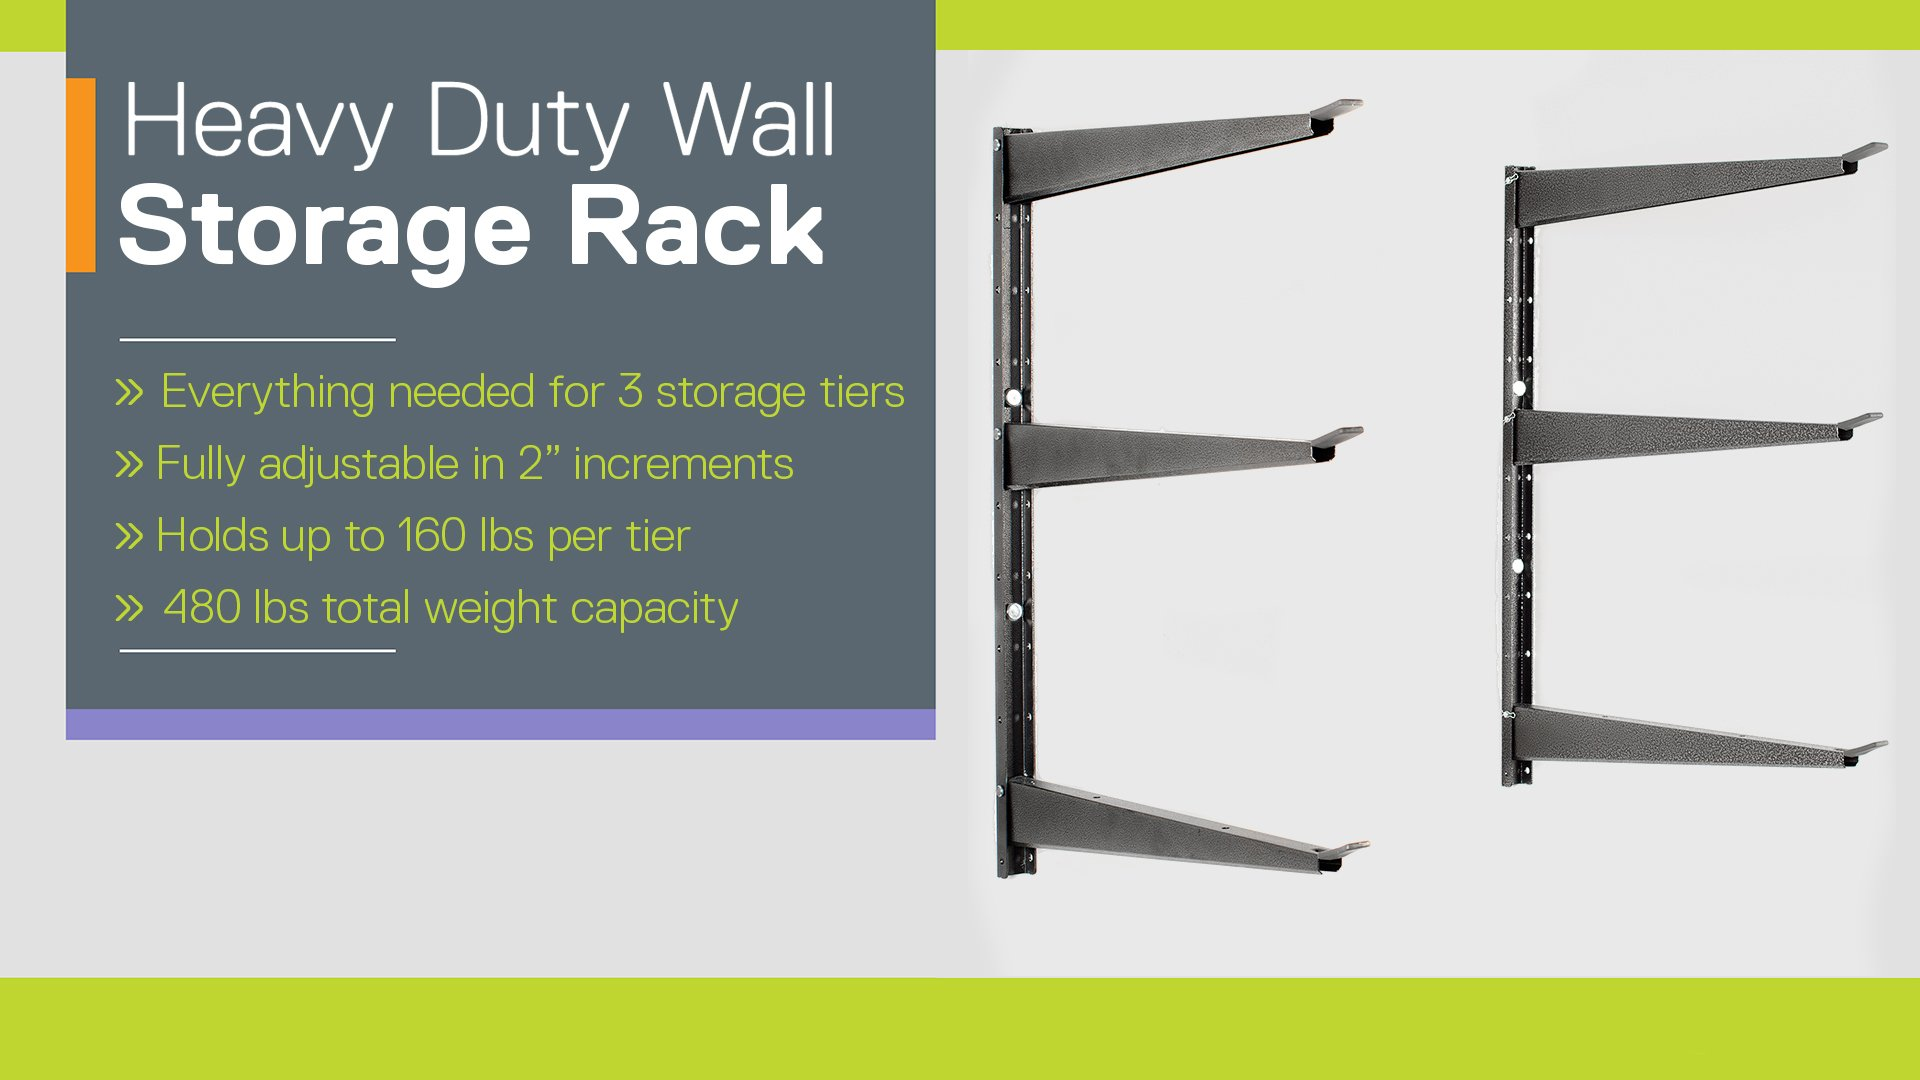 Heavy Duty Wall Storage Rack instructions